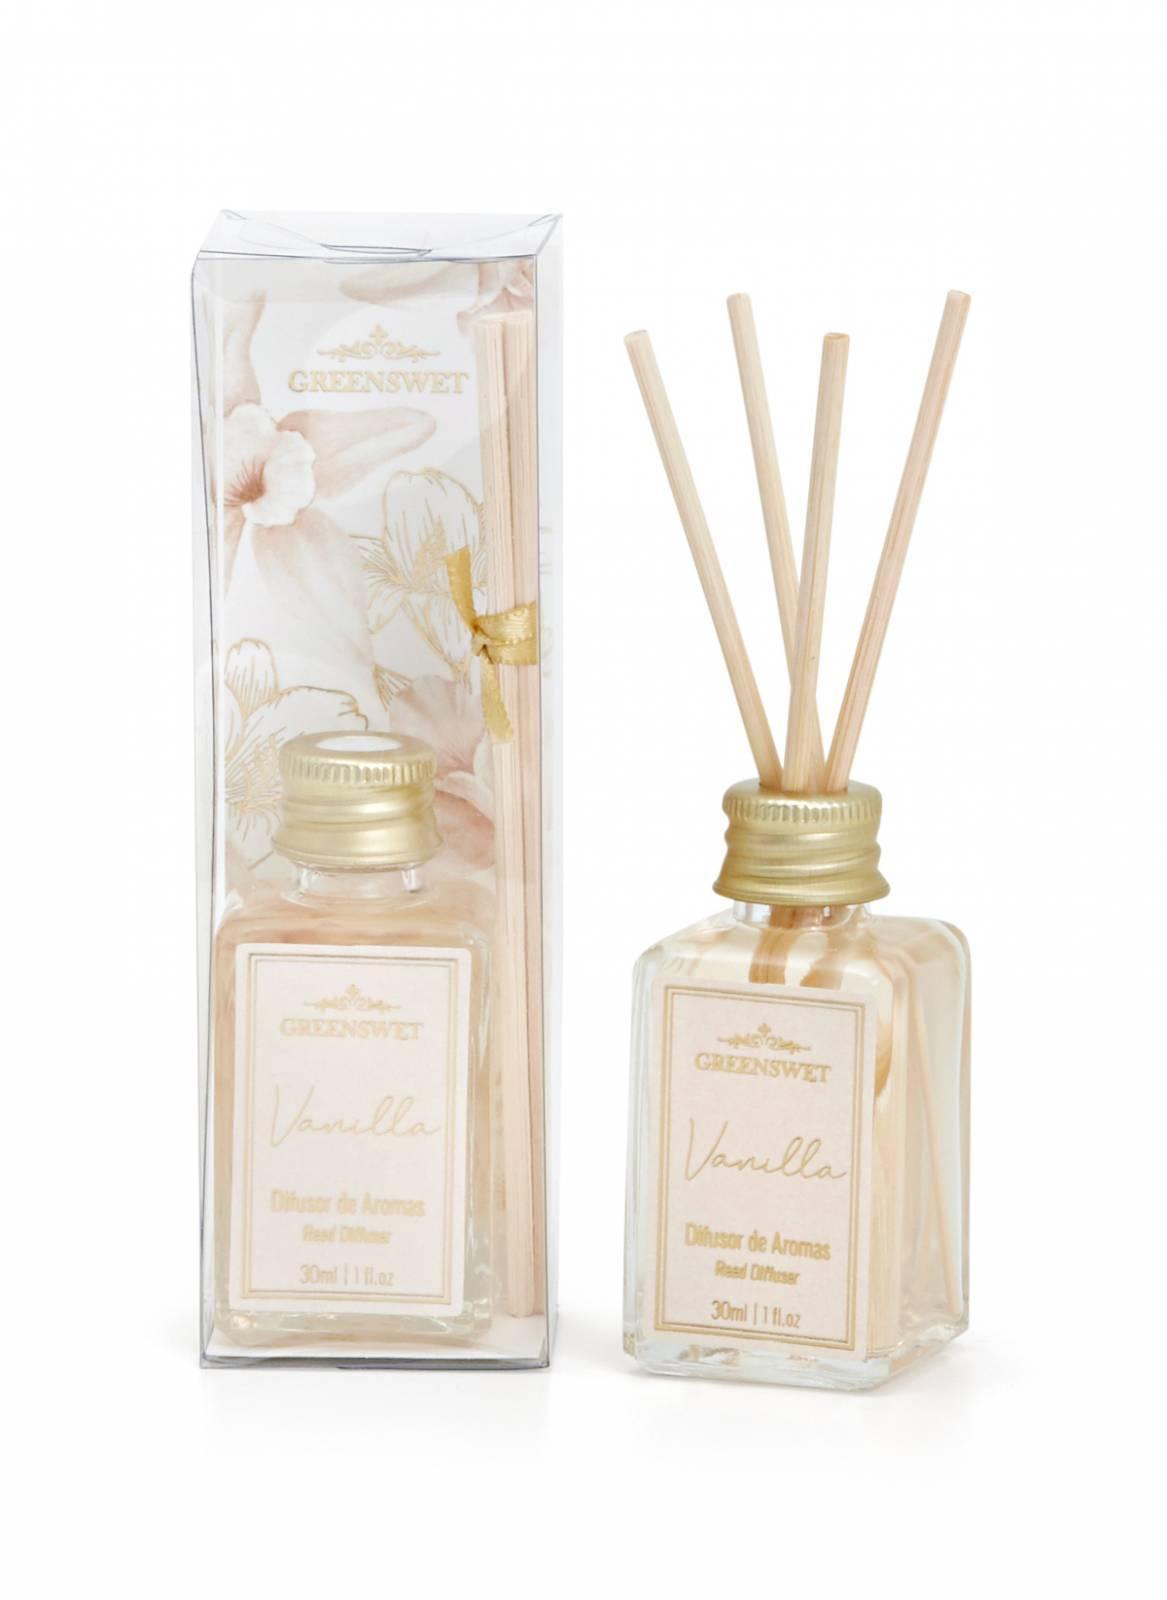 Difusor de Aromas 30ml Essência Vanilla - Greenswet Aromatizantes